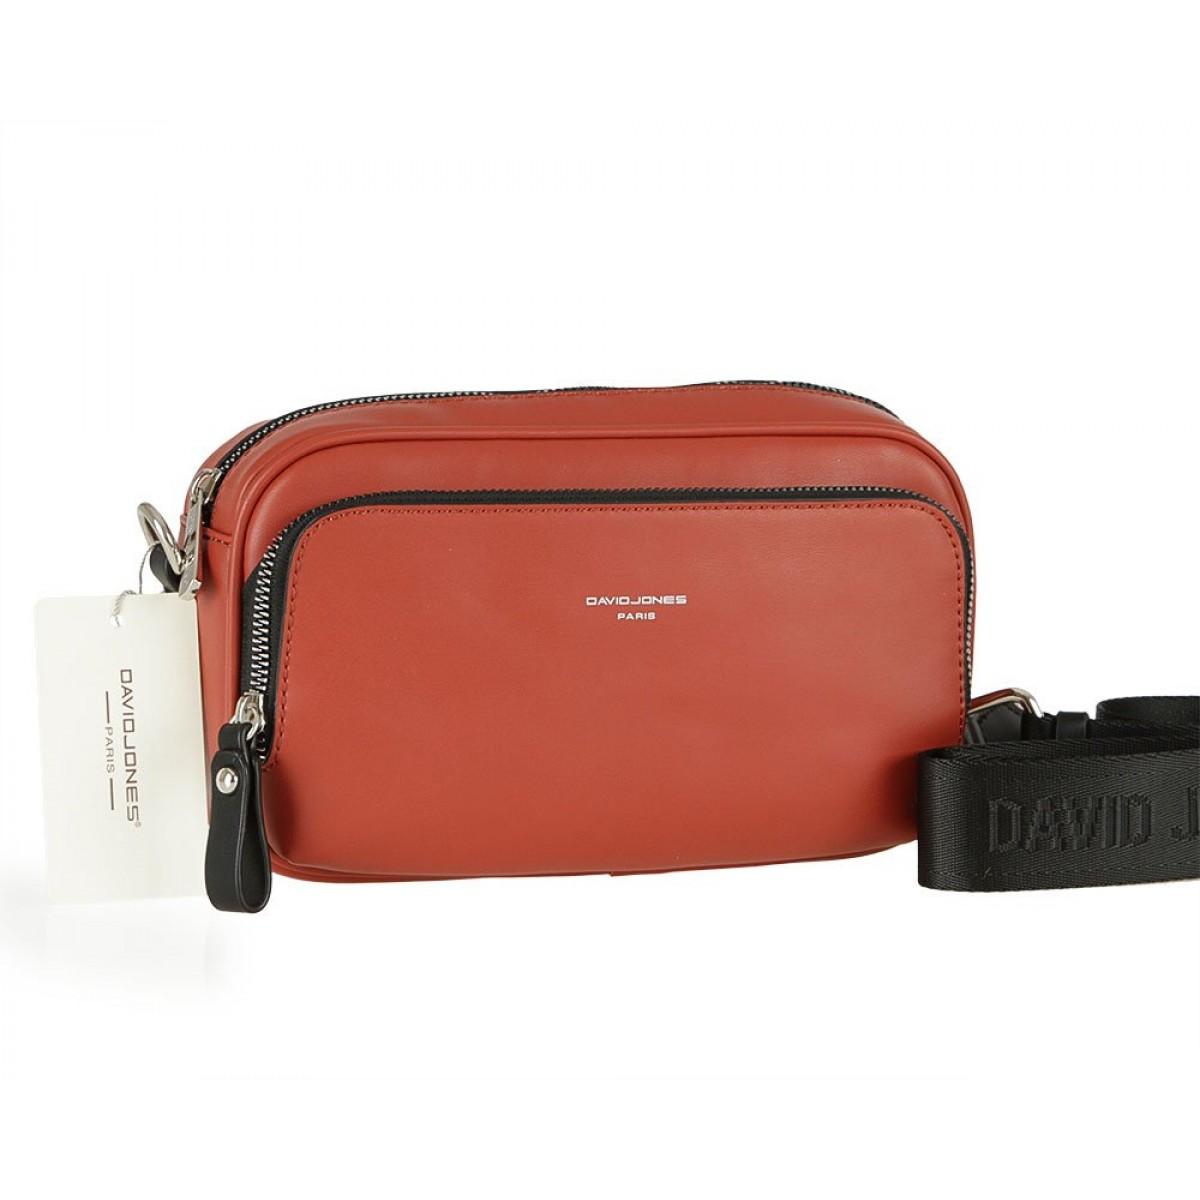 Жіноча сумка David Jones CM5849 SIENNA